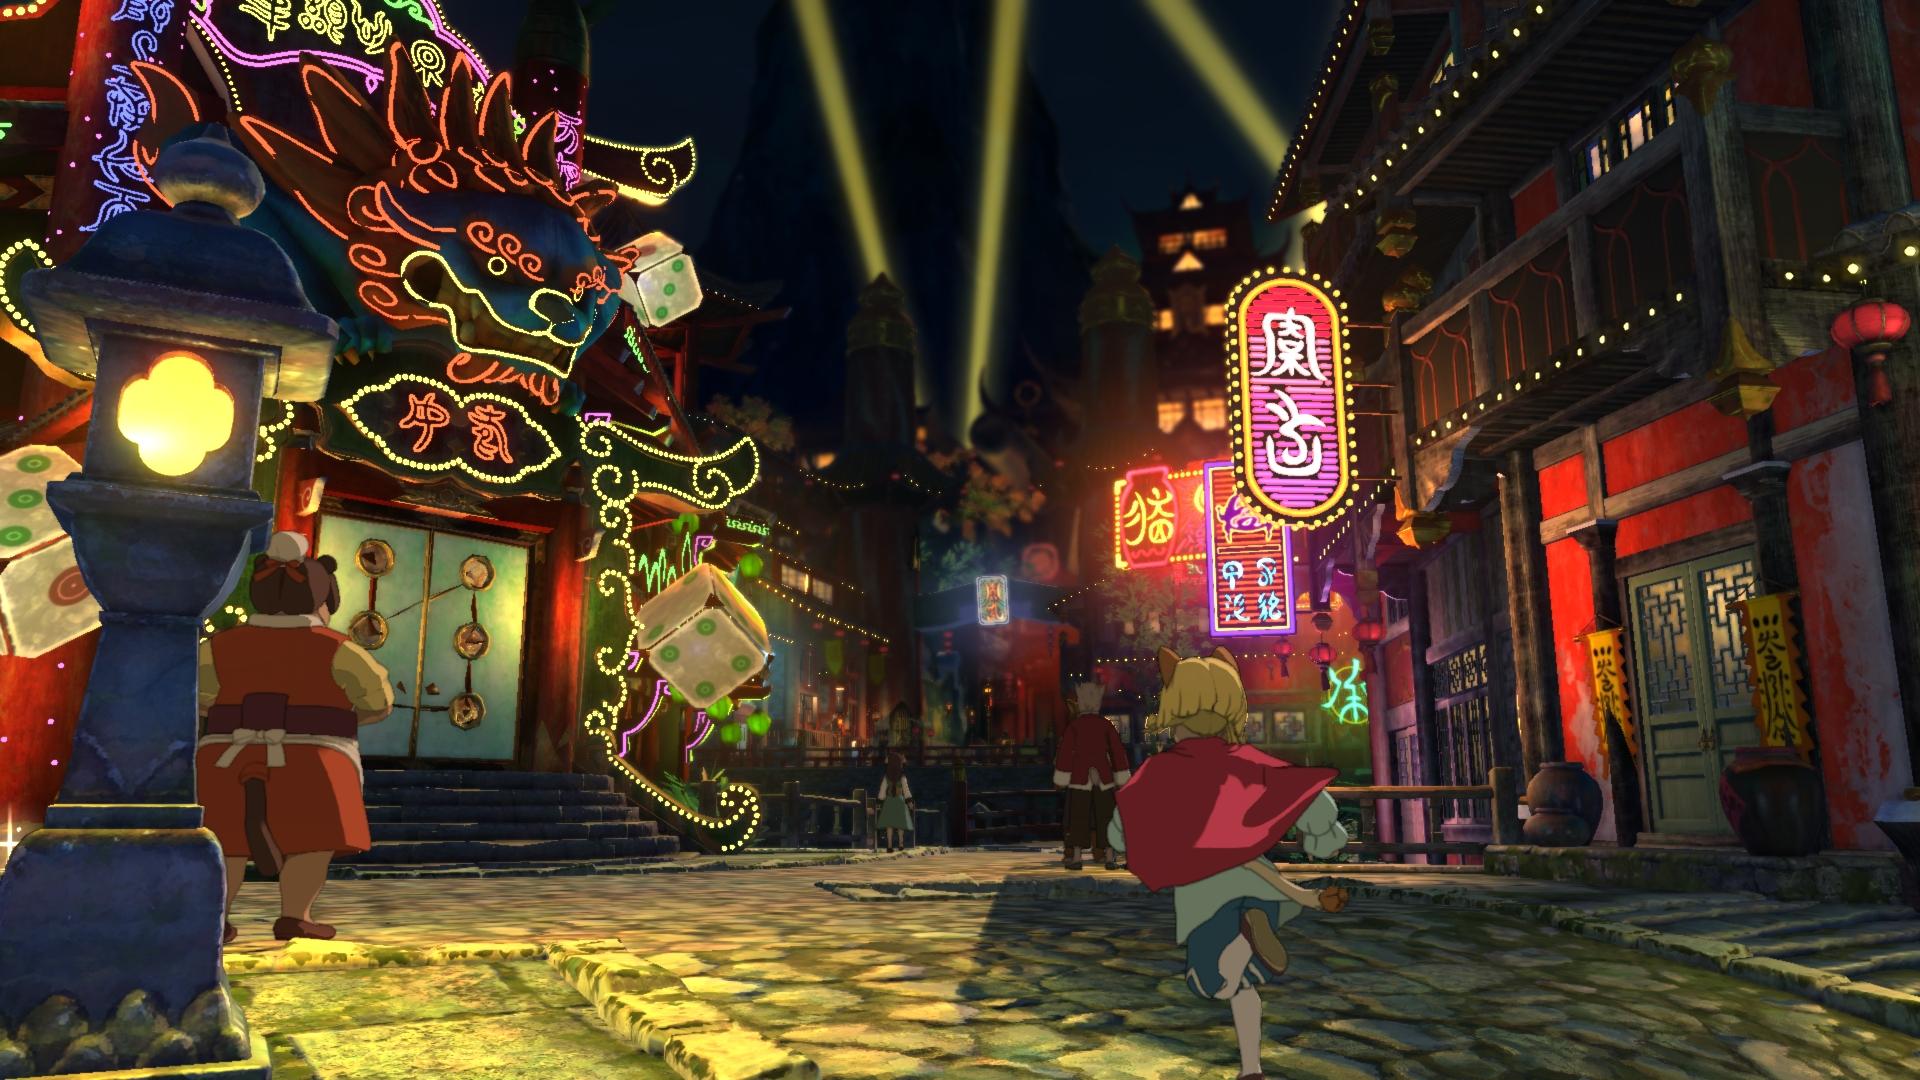 Ni no Kuni II: Revenant Kingdom v traileru a na screenshotech pro letošní Gamescom 148575